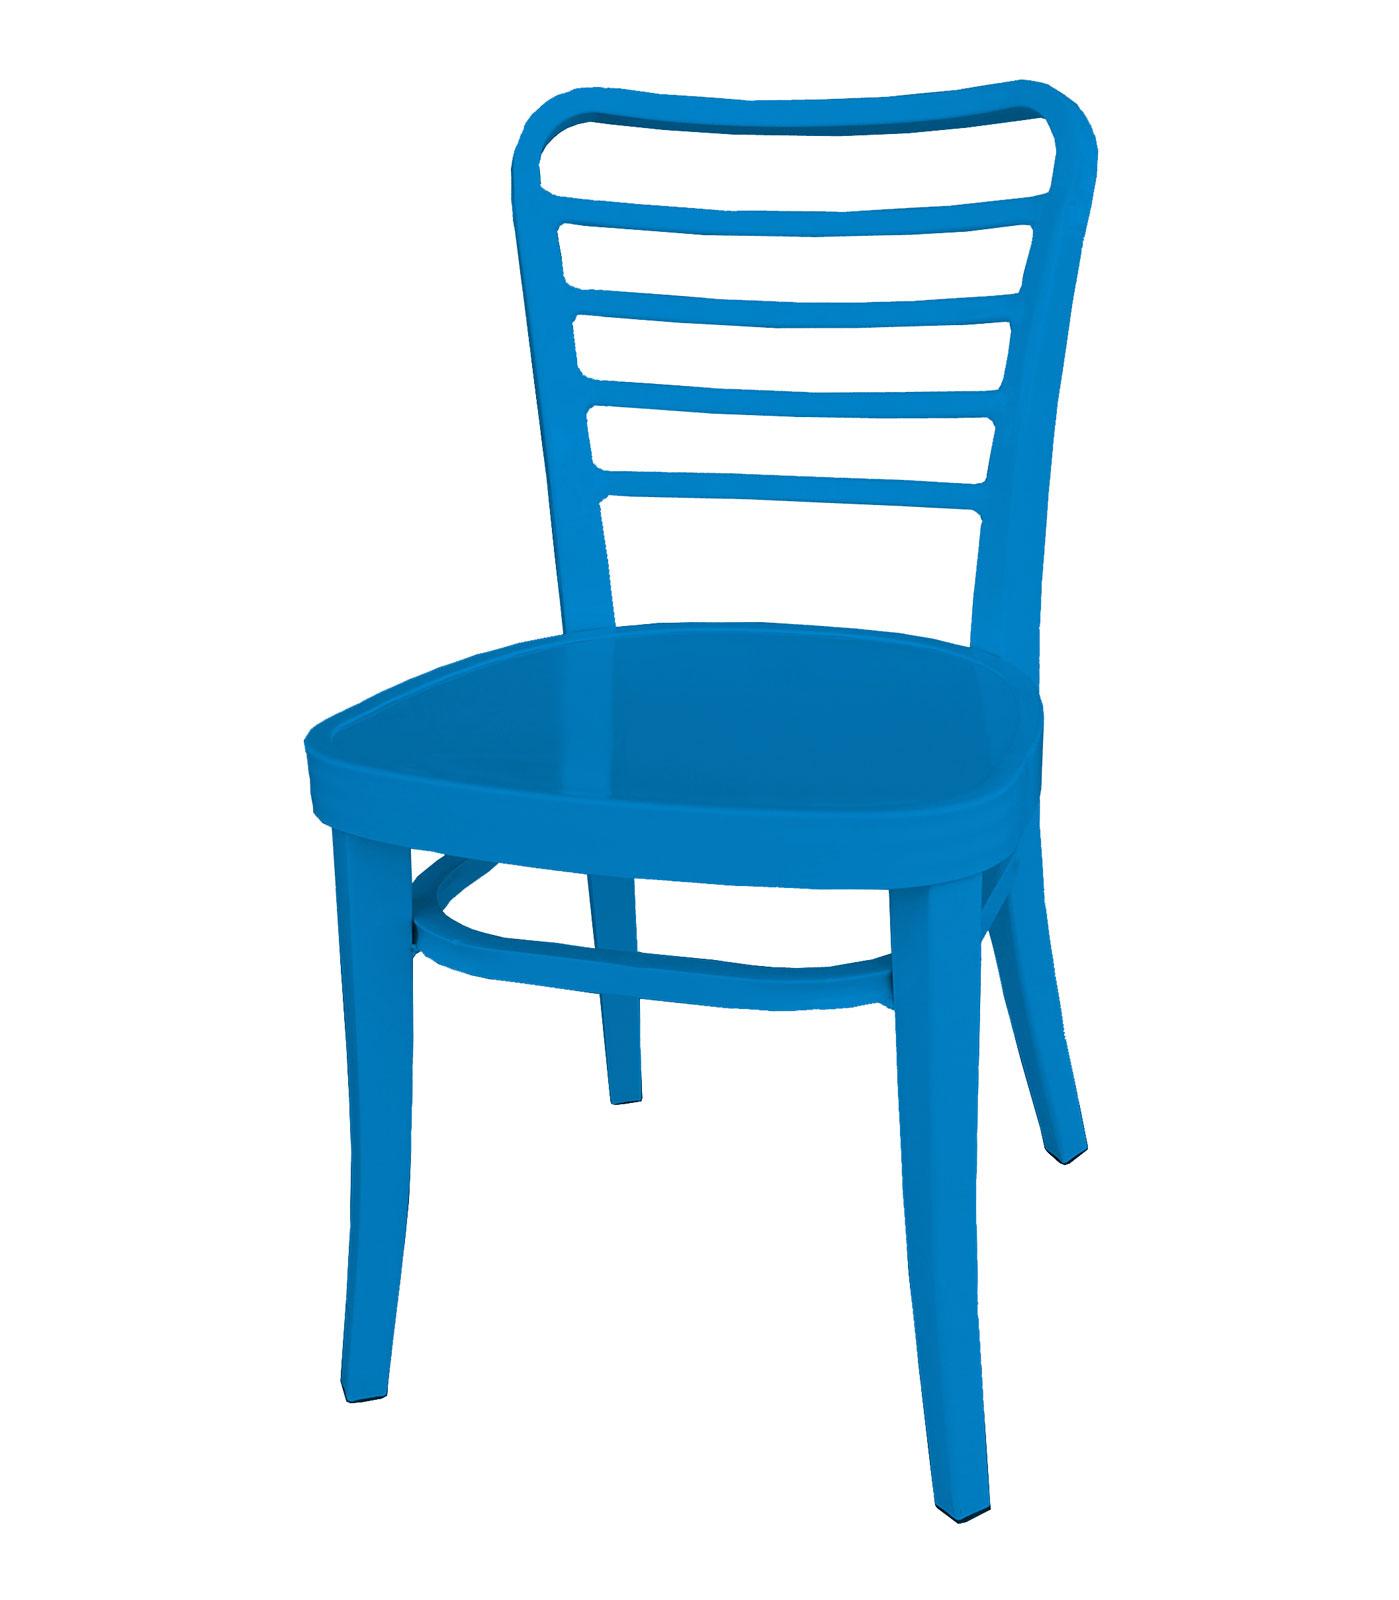 Clip art library . Furniture clipart blue chair